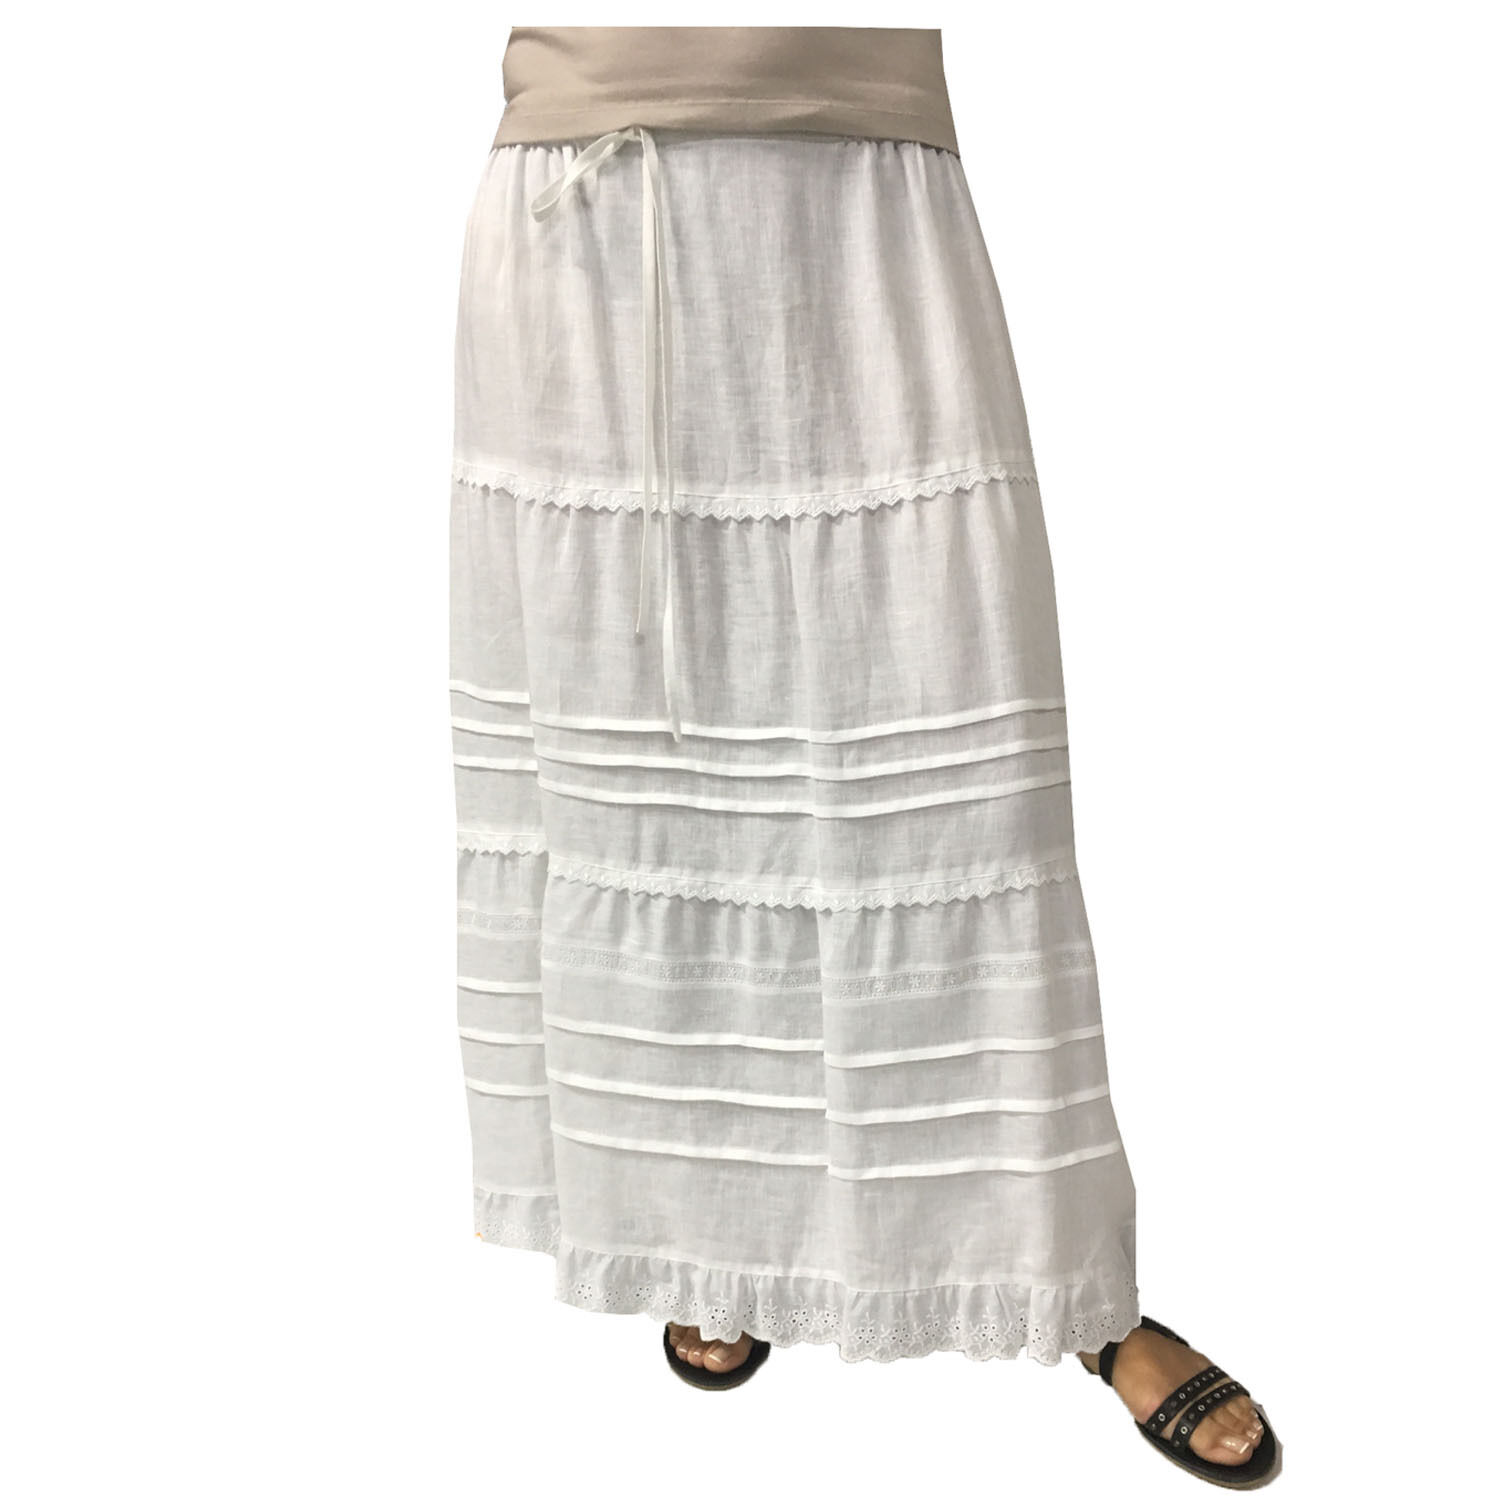 MARINA SPORT by MARINA Rinaldi skirt woman long white BENGAL elastic waist